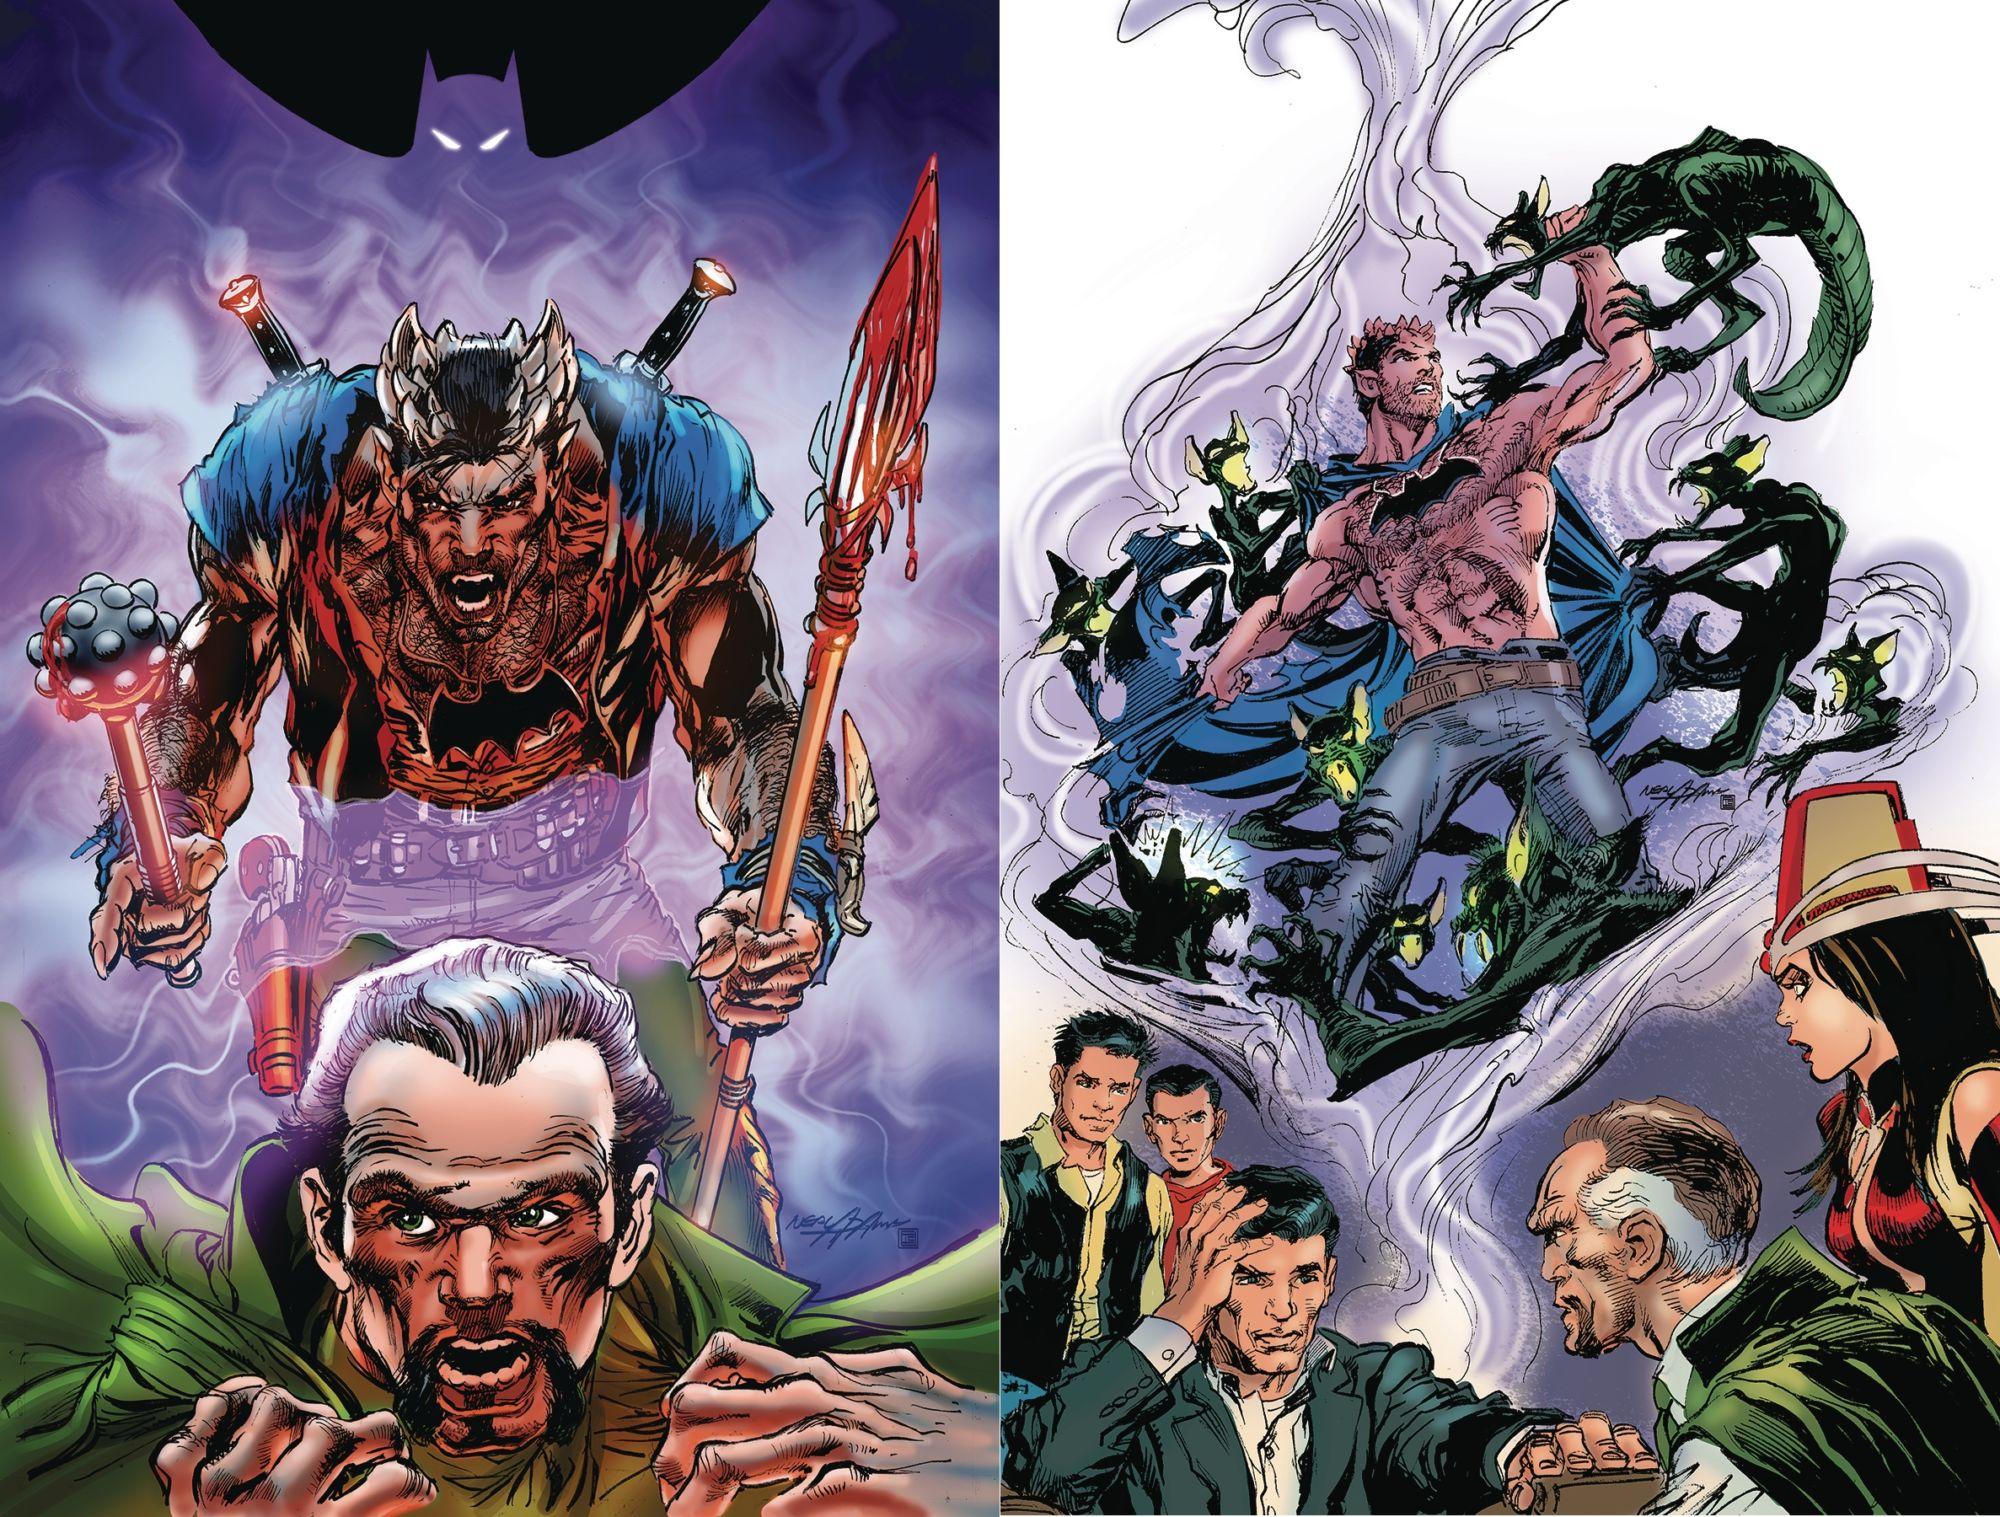 LATE: Batman Vs. Ra's Ah Ghul Continues to Slip…